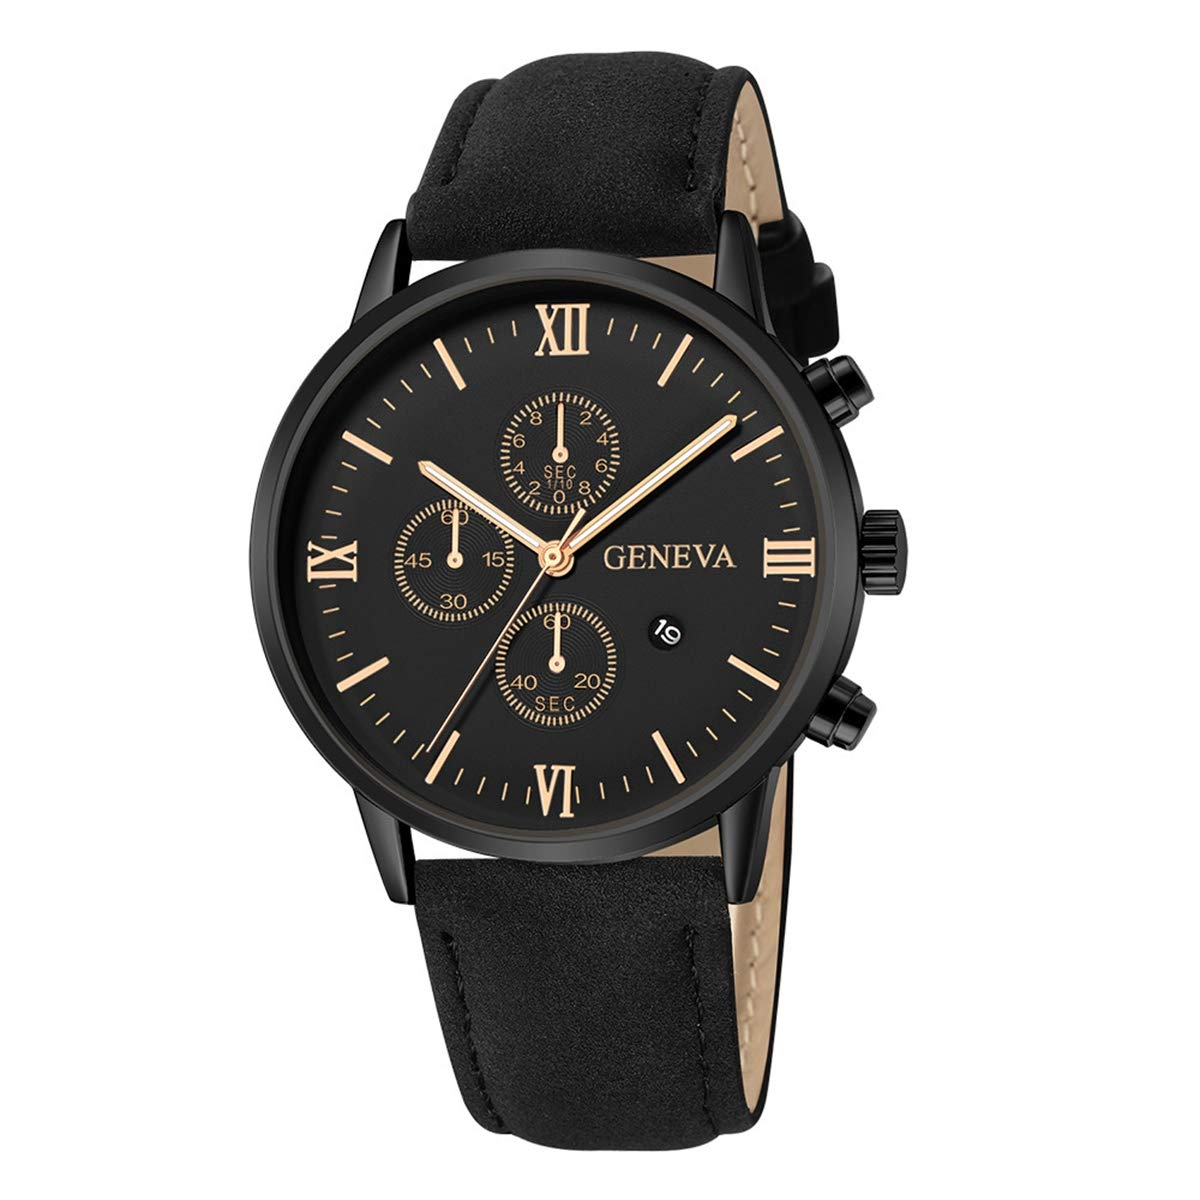 ZODRQ Men's Watch,Fashion Life Waterproof Sport Watches Leather Band Wrist Watch Wristwatch Date Quartz Watch for Men Gift (K) by ZODRQ